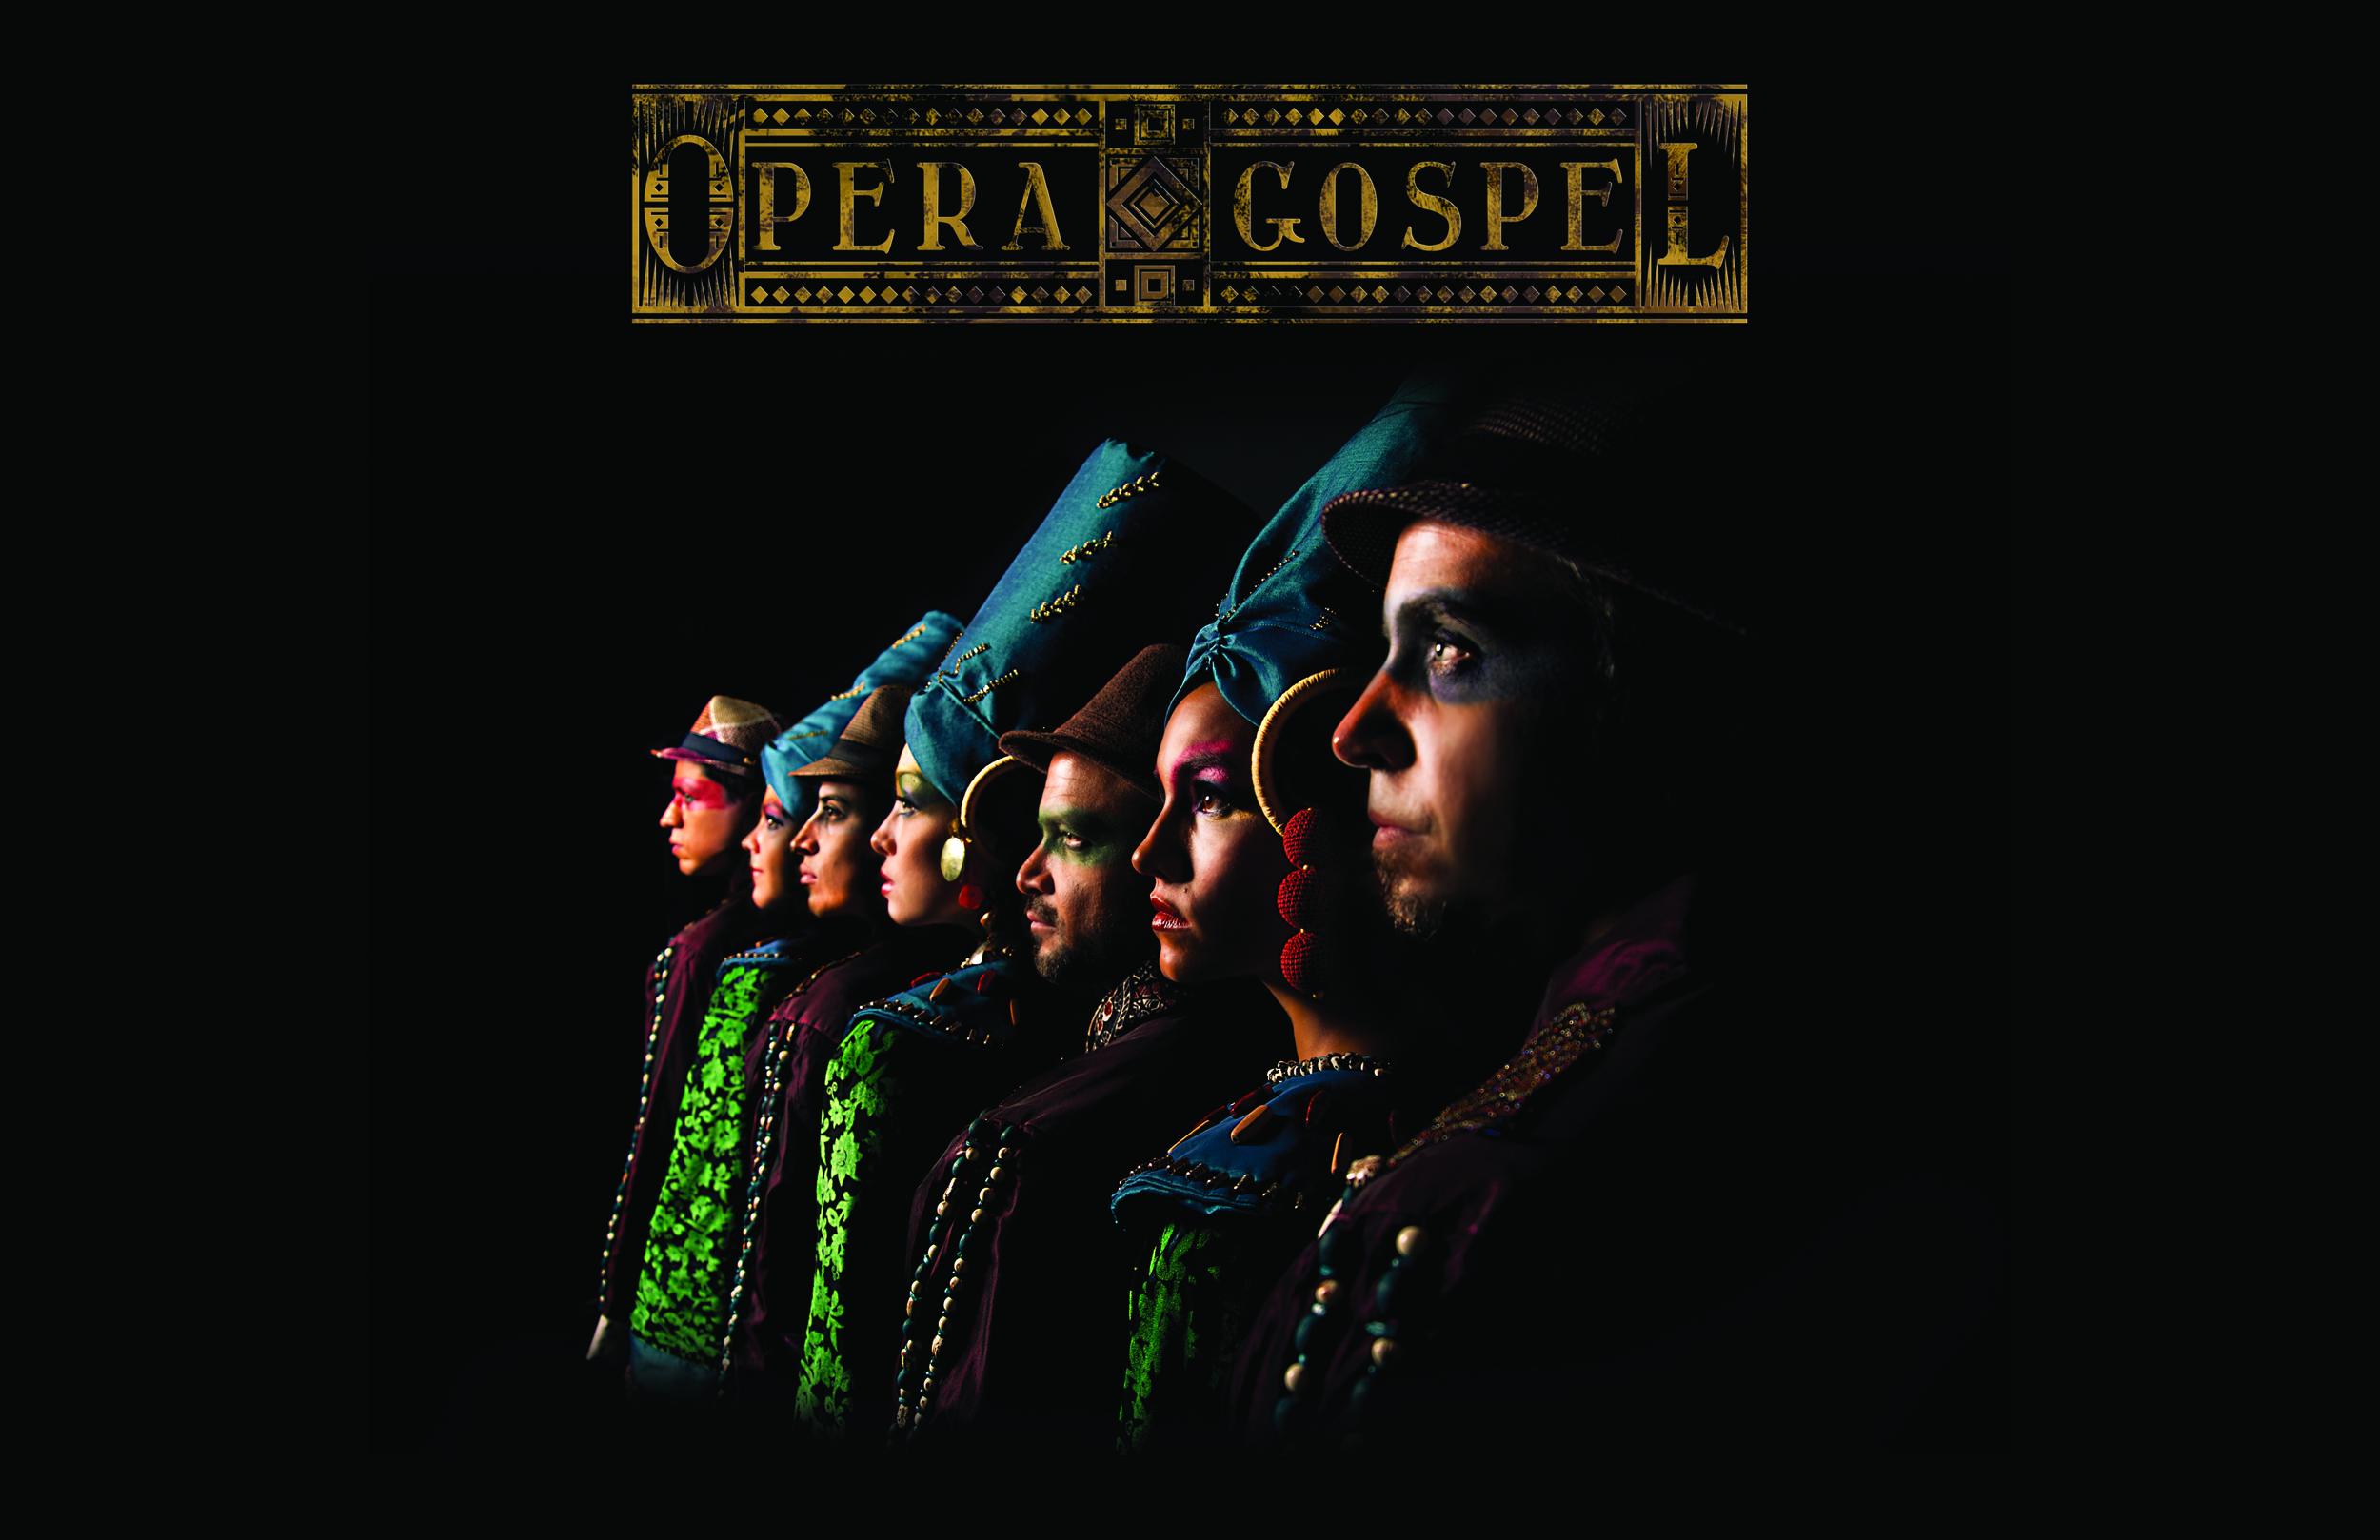 Opera Gospel Rock